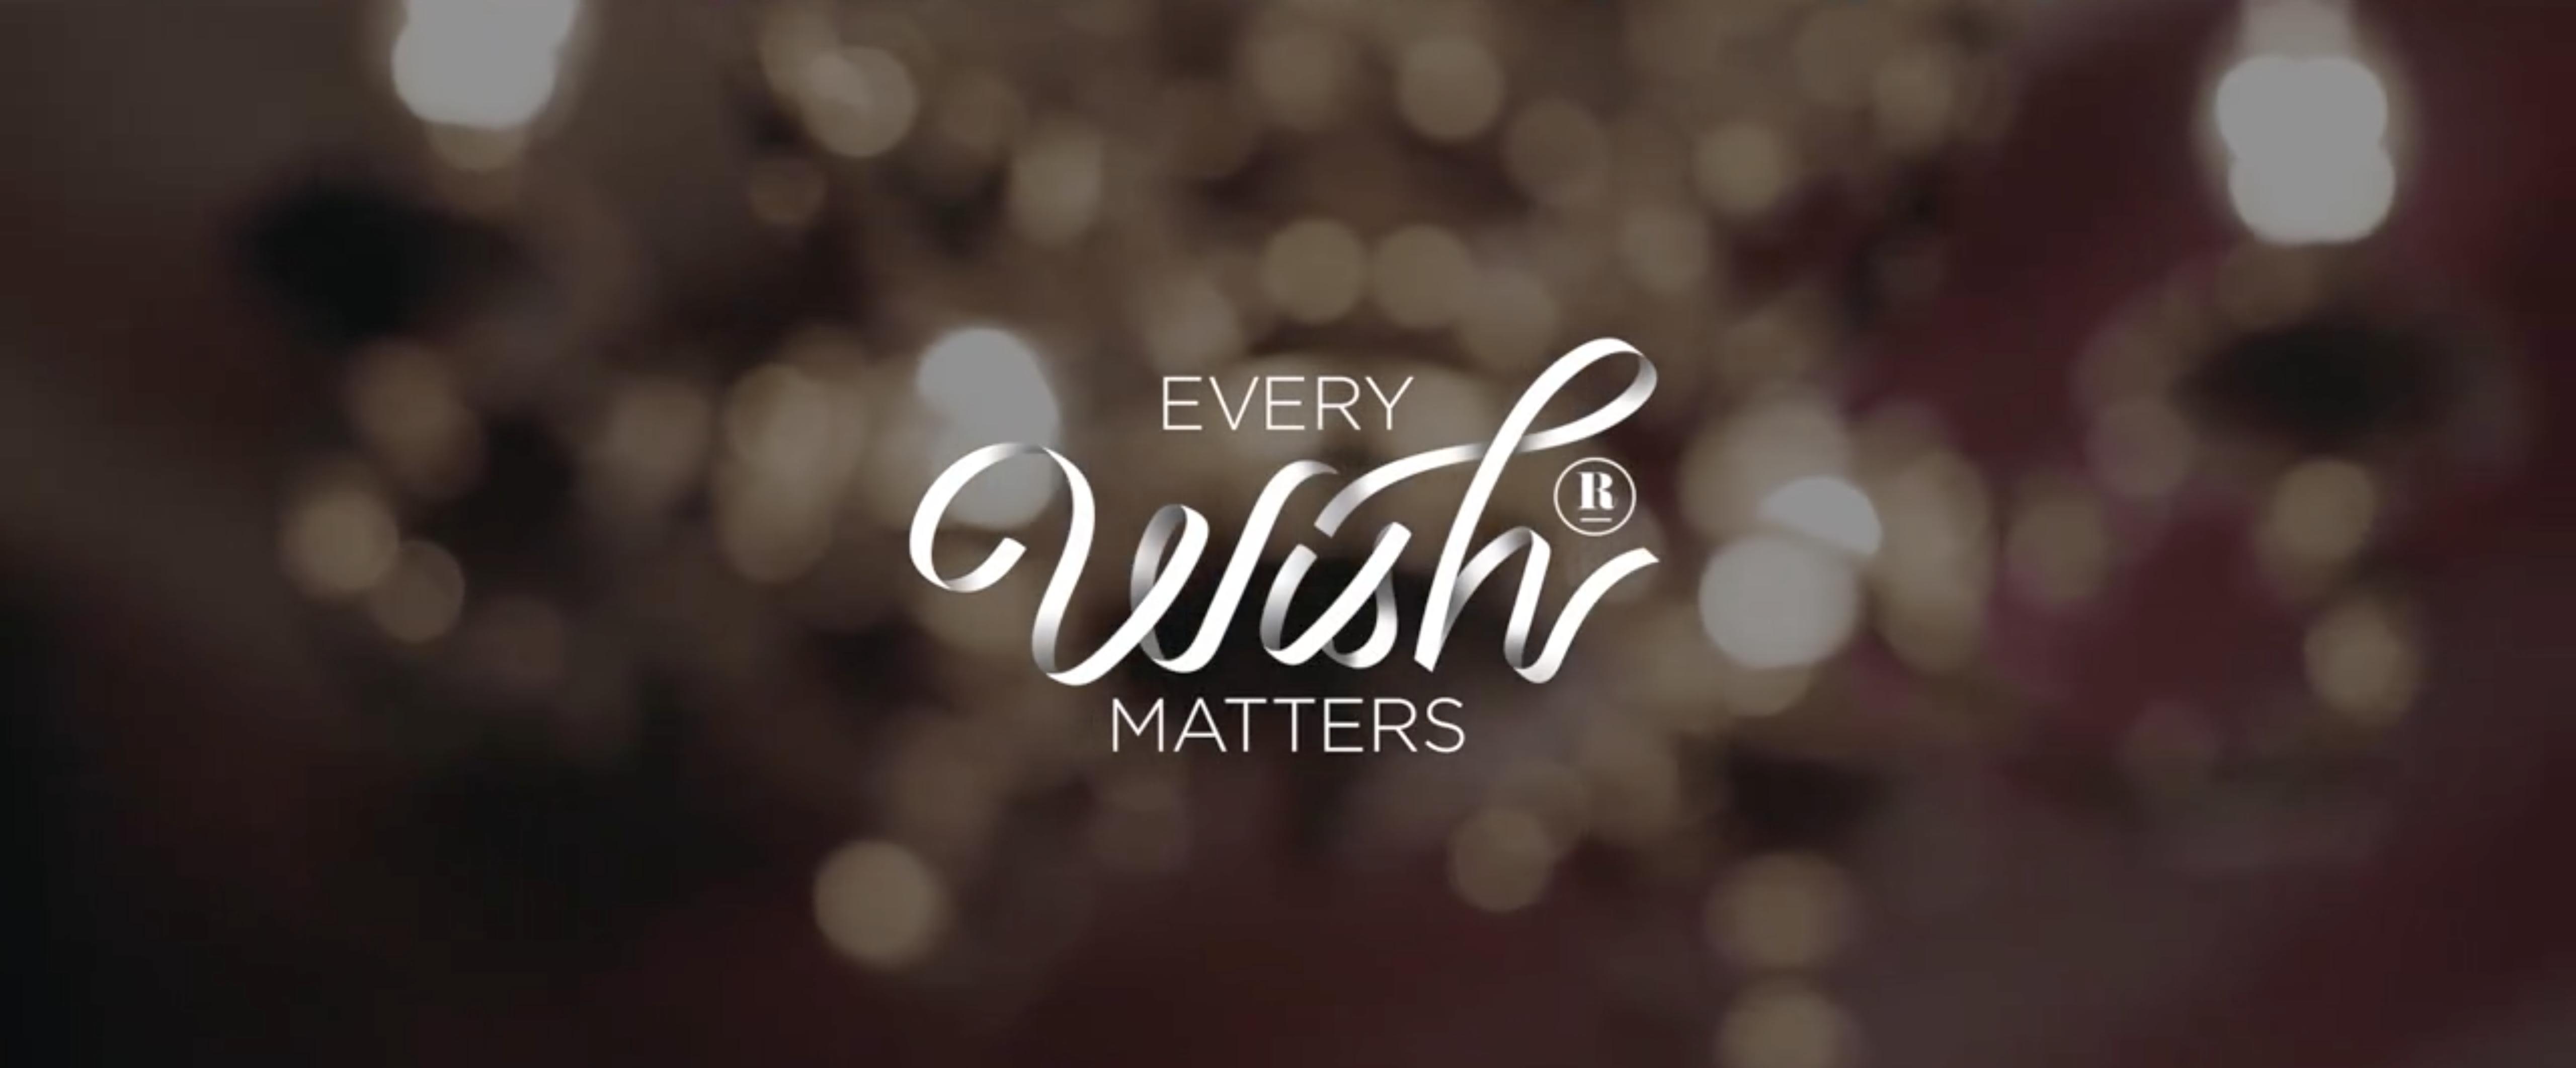 Robinsons: Every Wish Matters